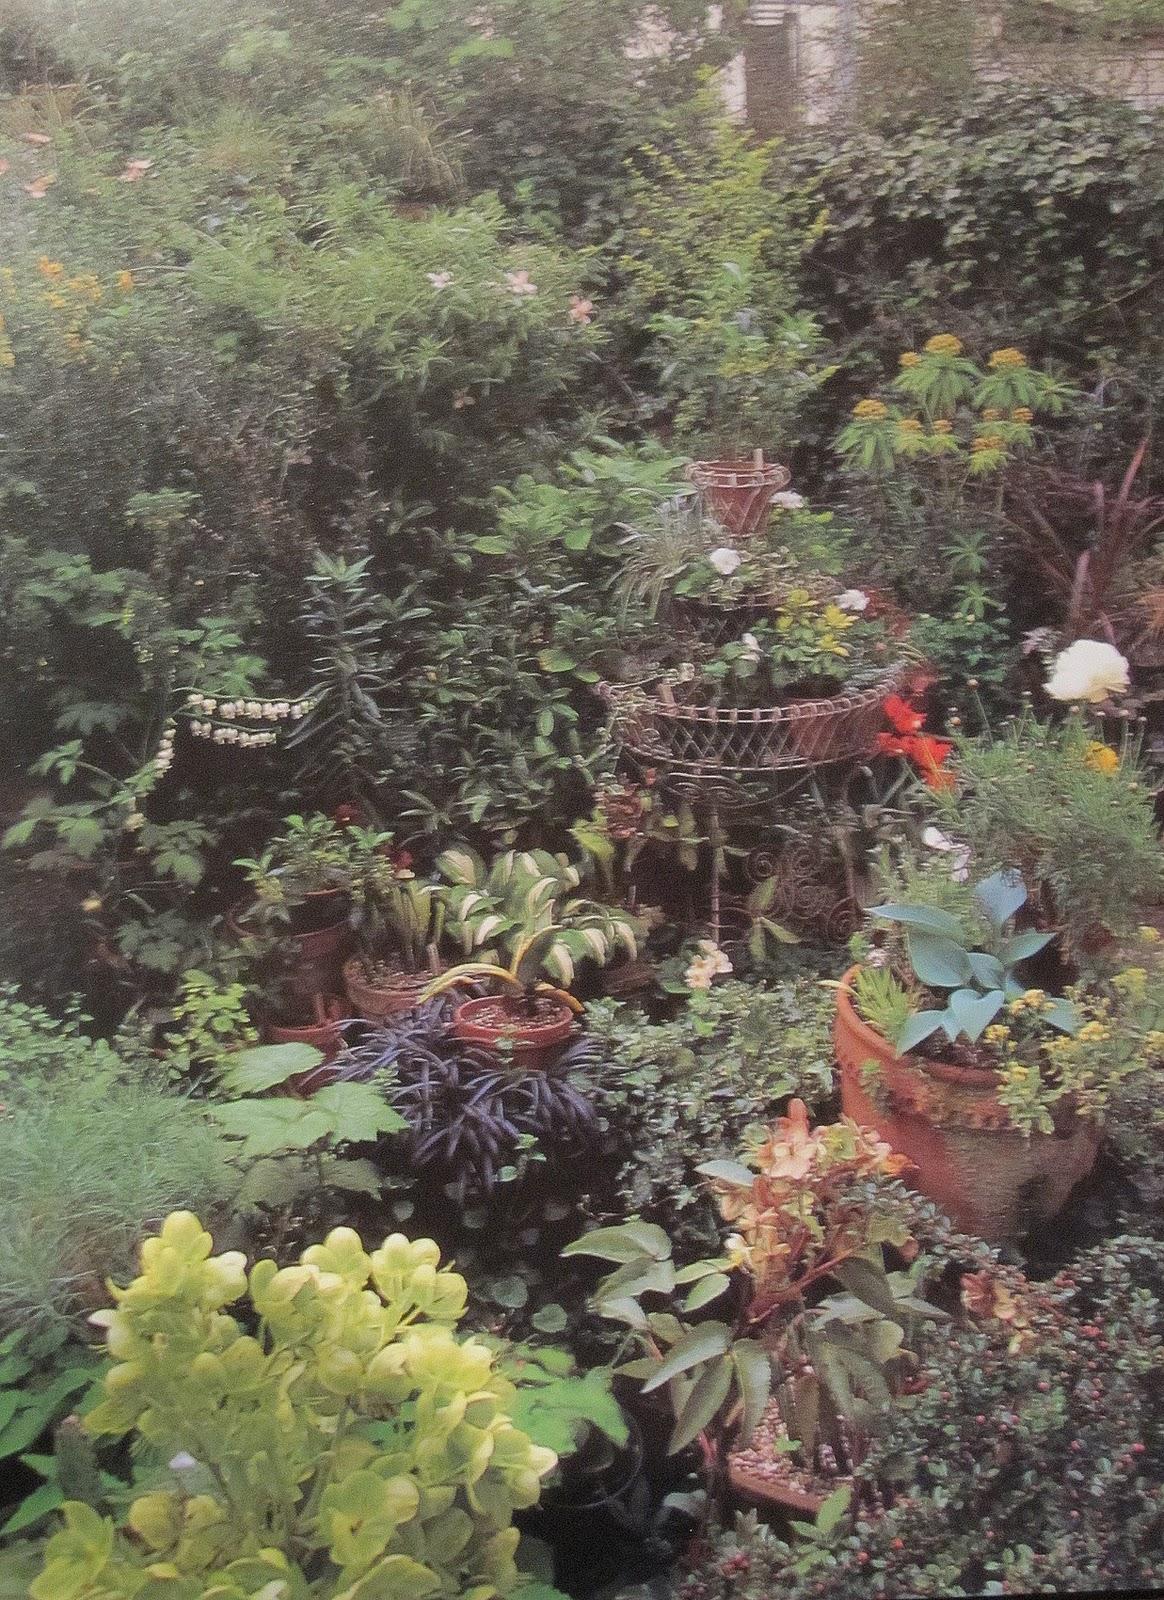 Paradis Express: Tout Petits Jardins, Jill Billington, 1999